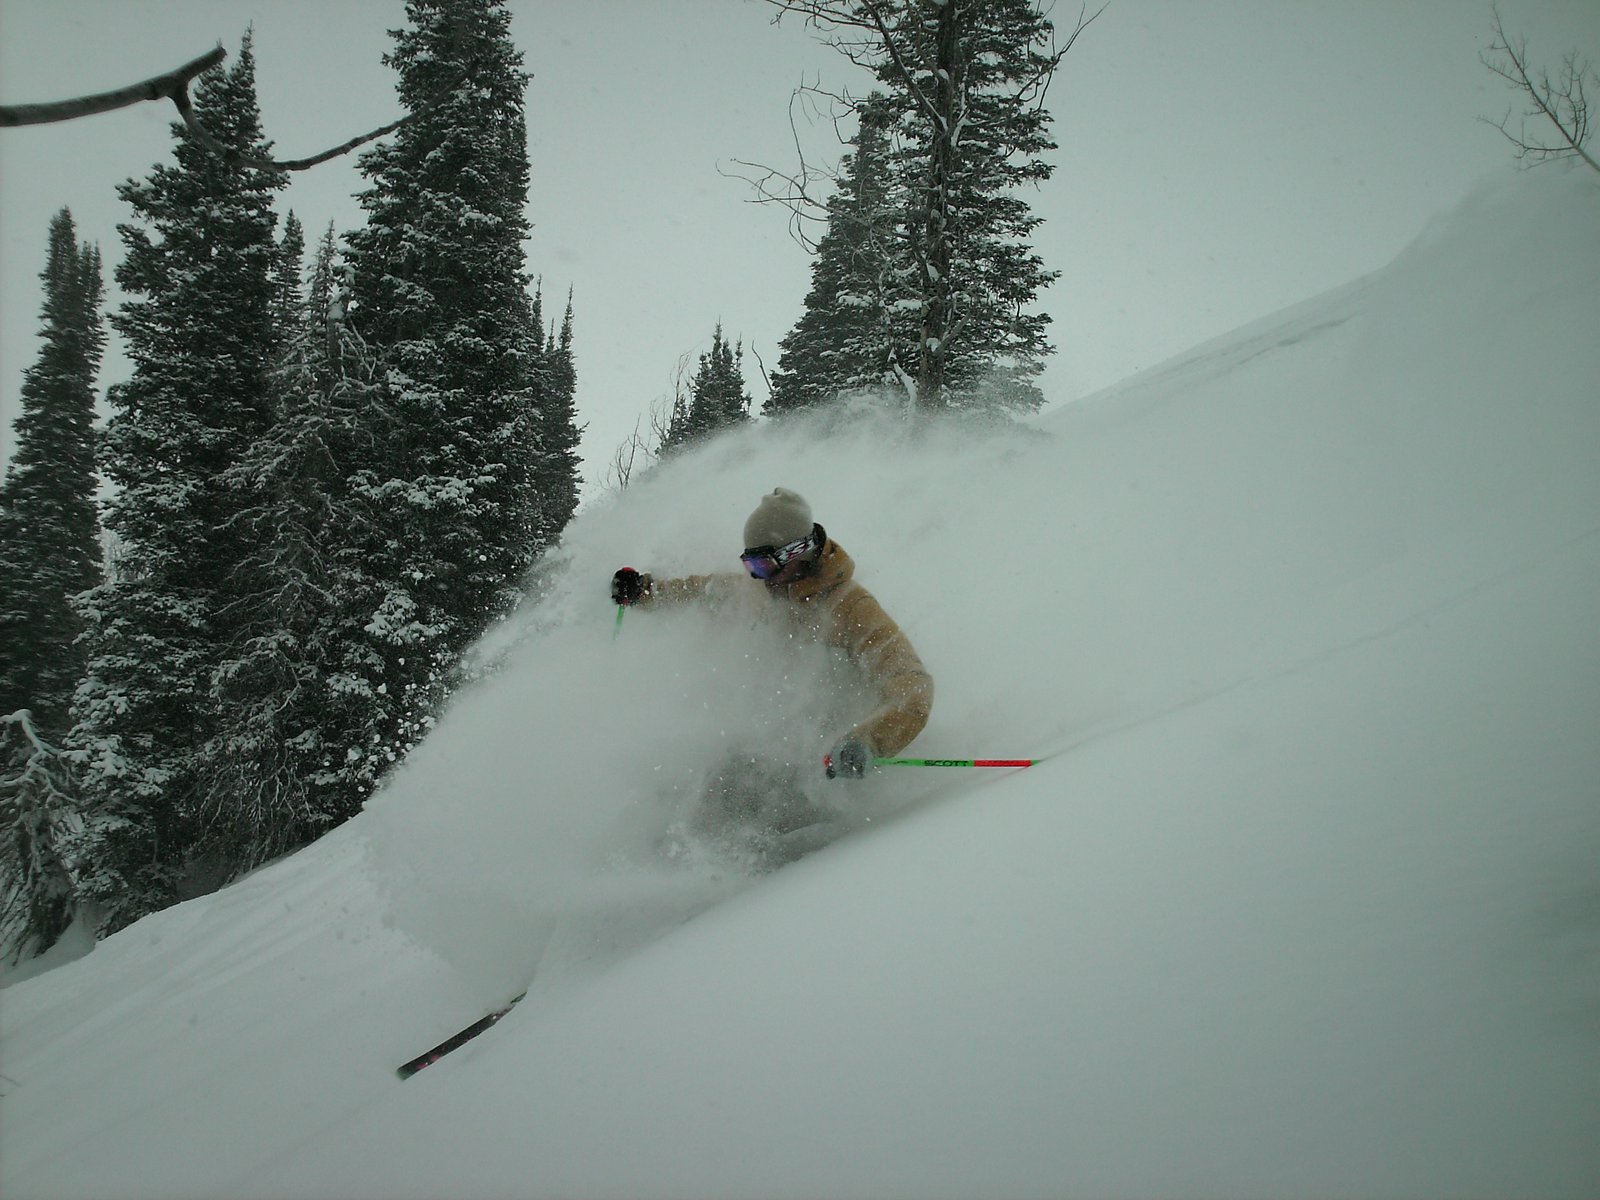 Pow at snowbasin